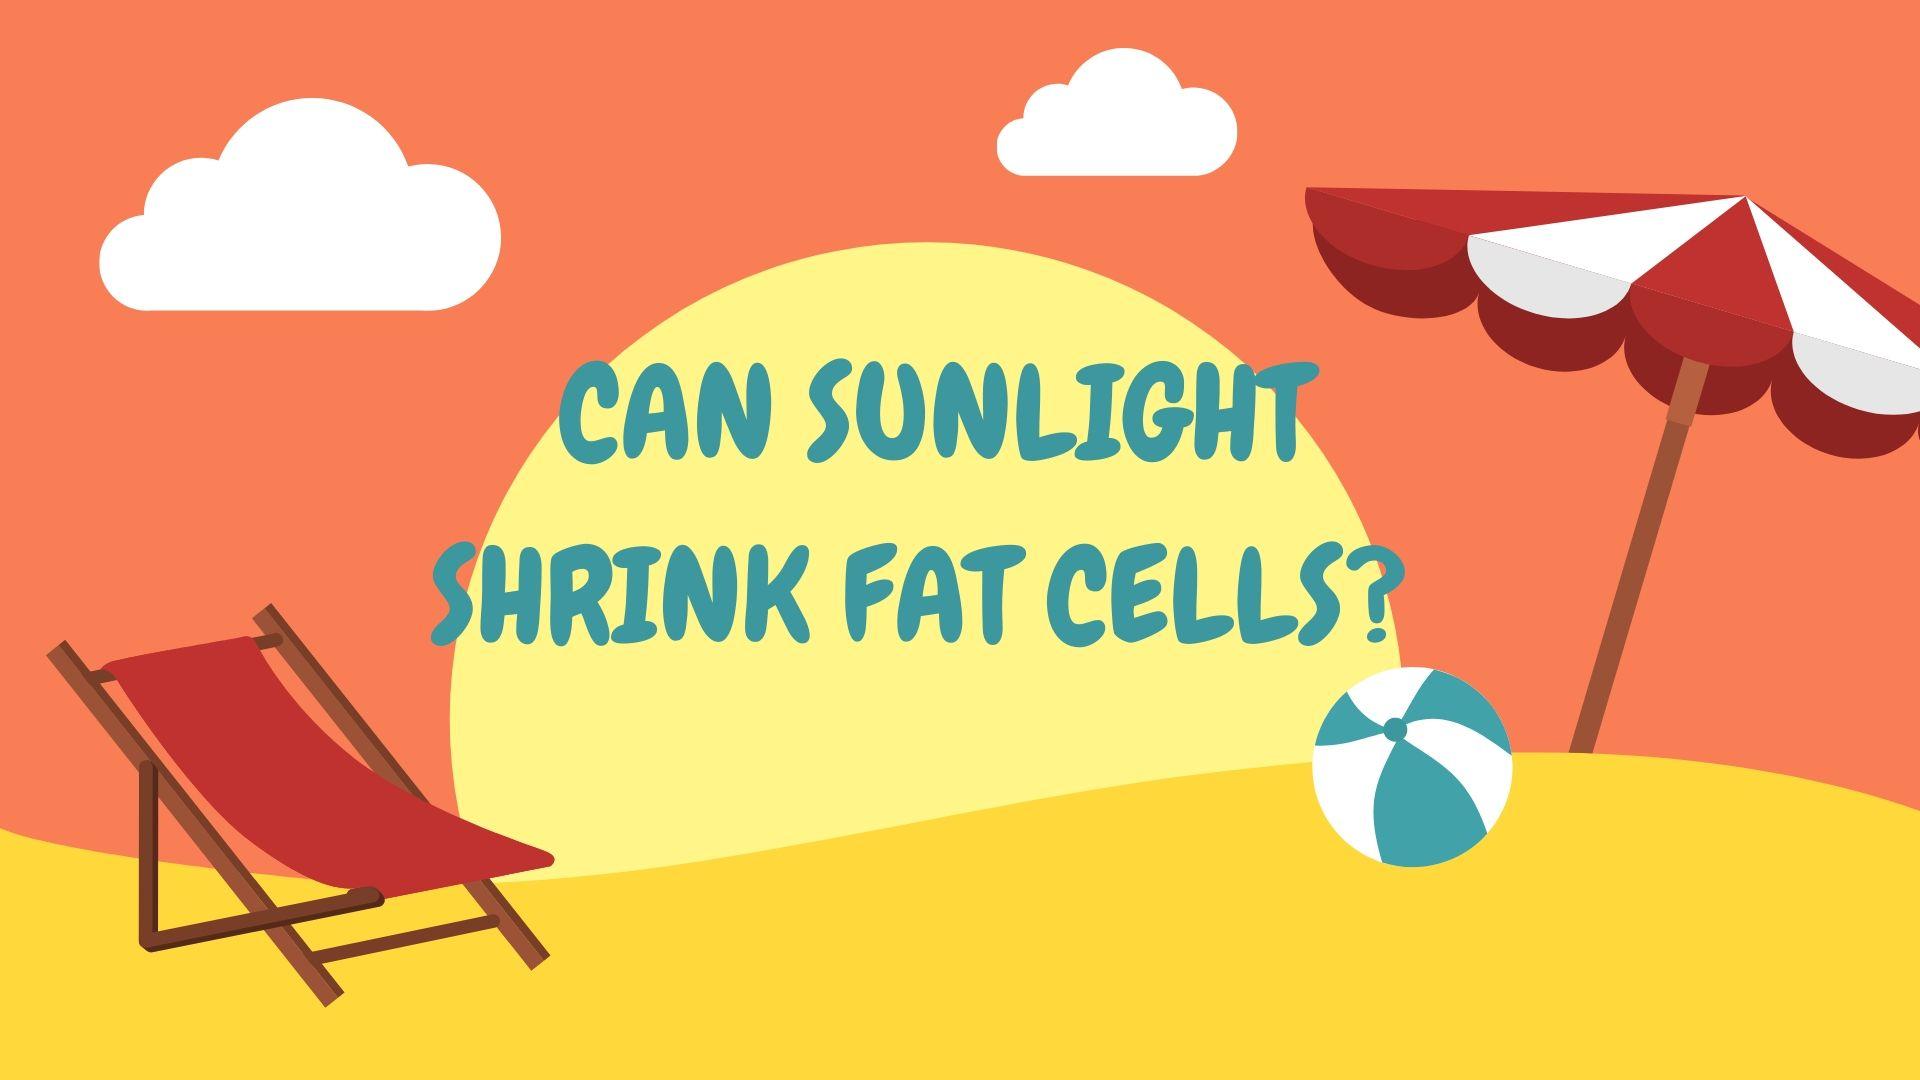 shrink fat cells